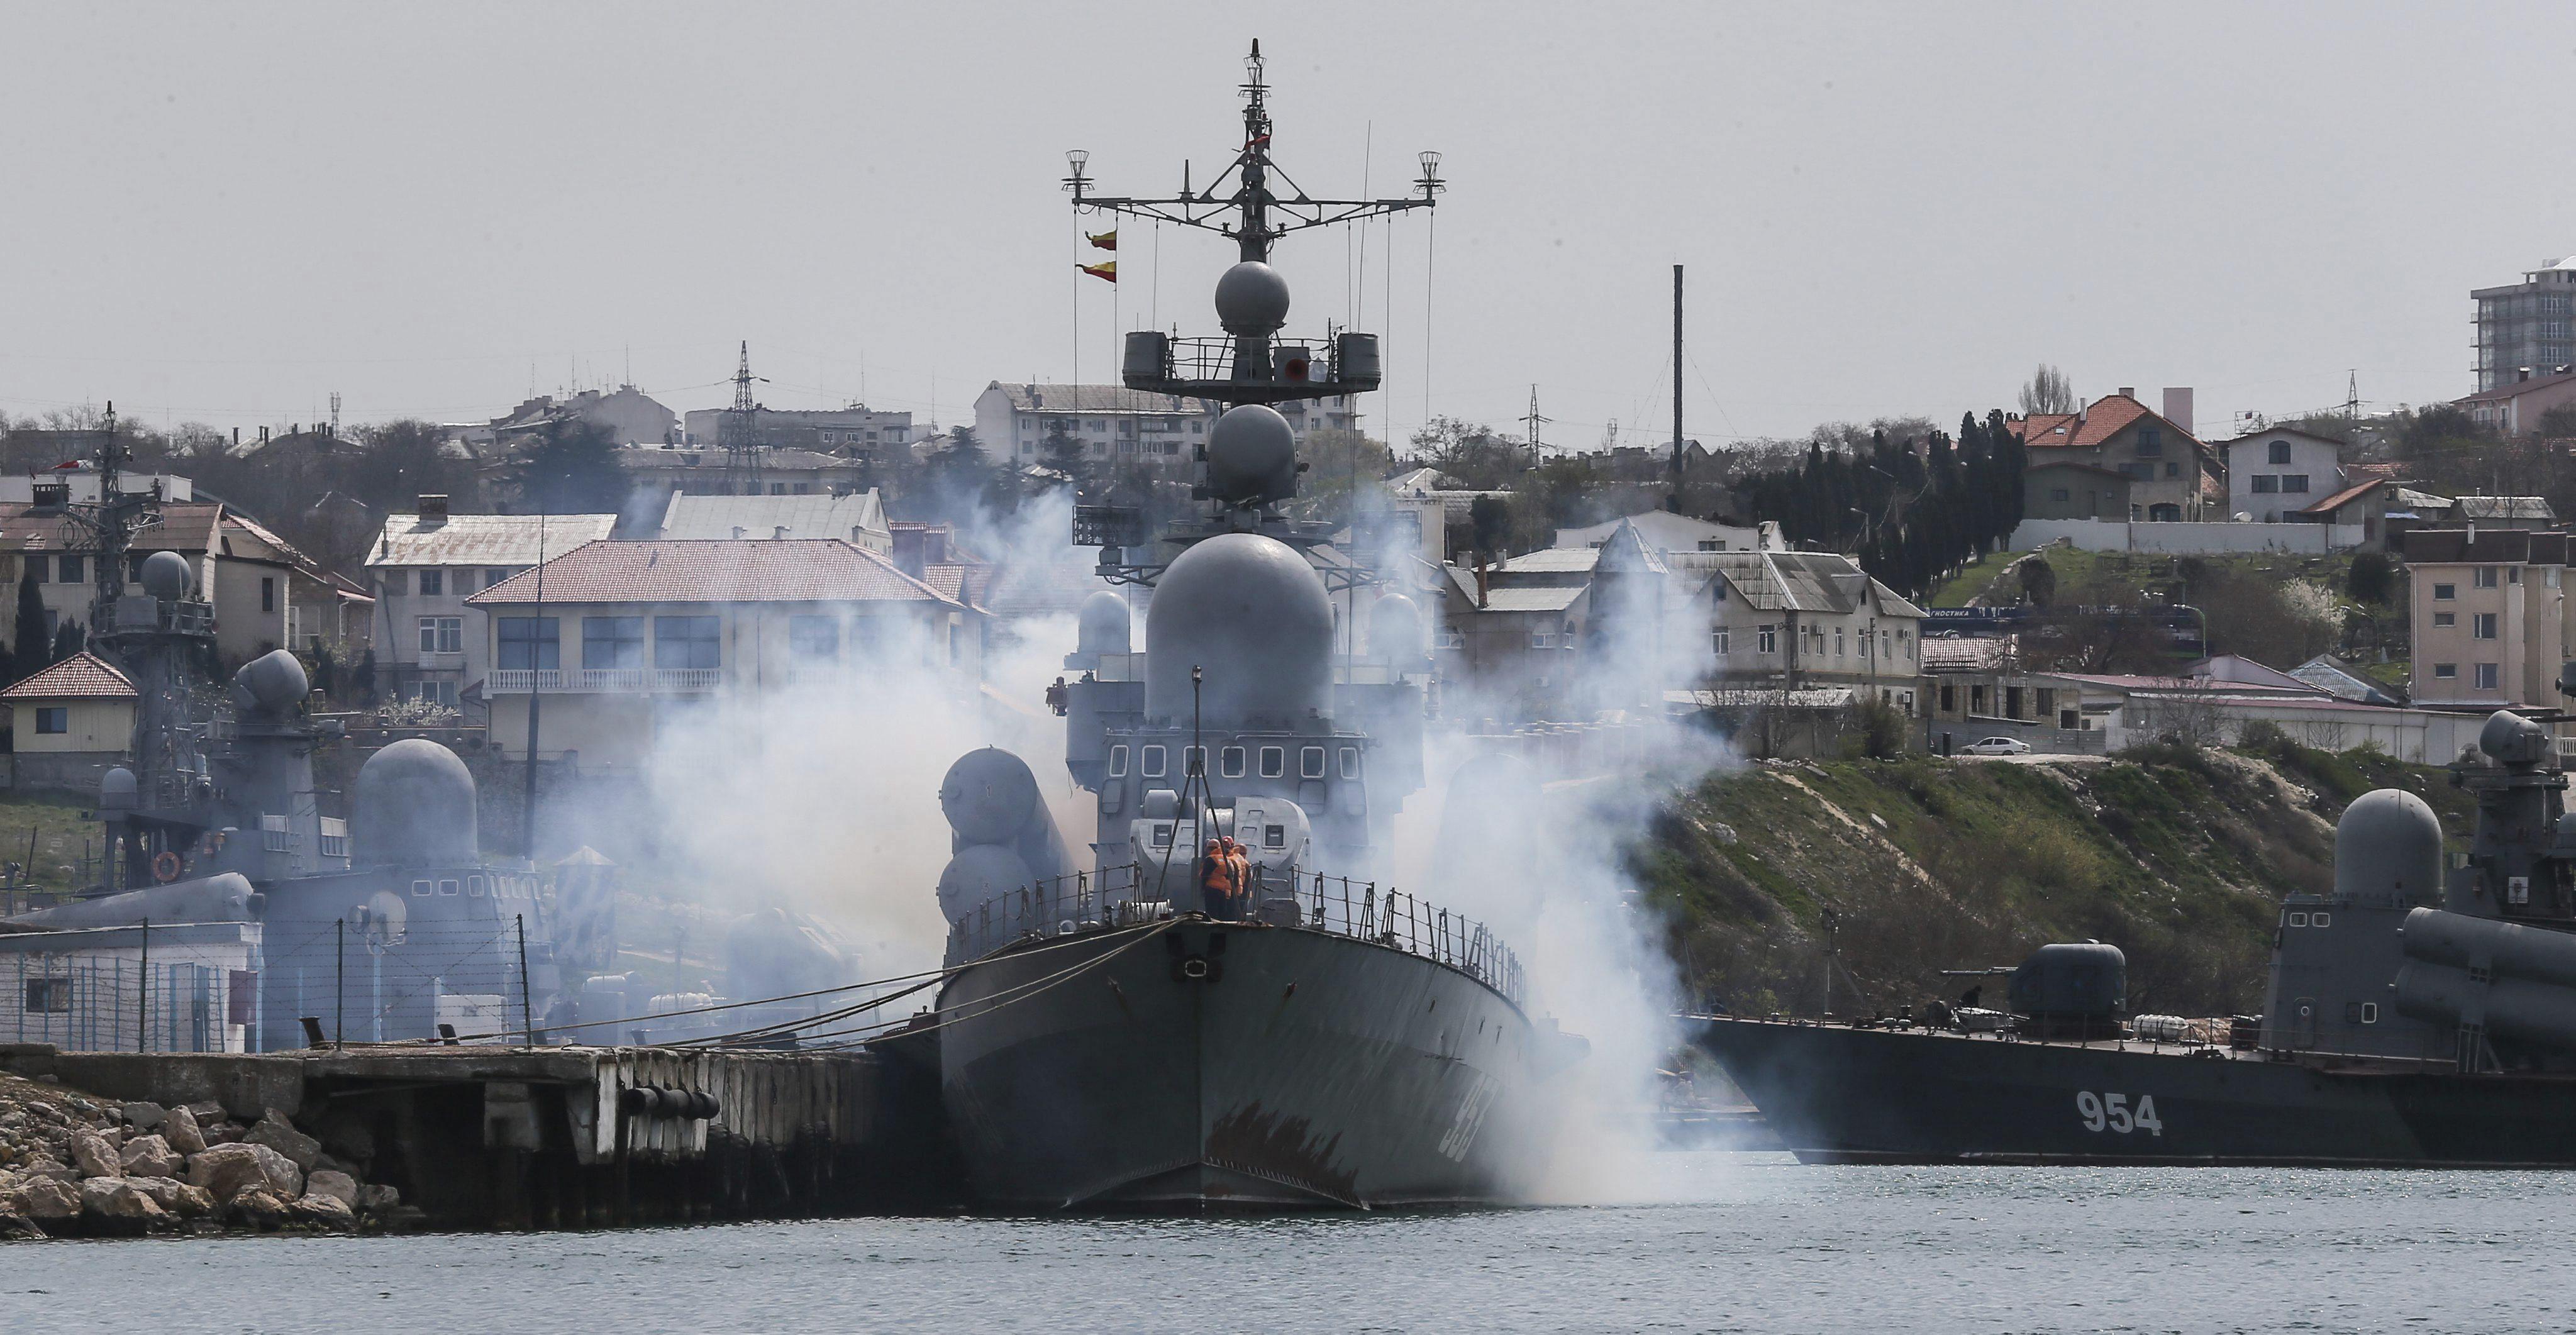 Putin nombra a un exjefe naval ucraniano como segundo de la Flota del mar Negro